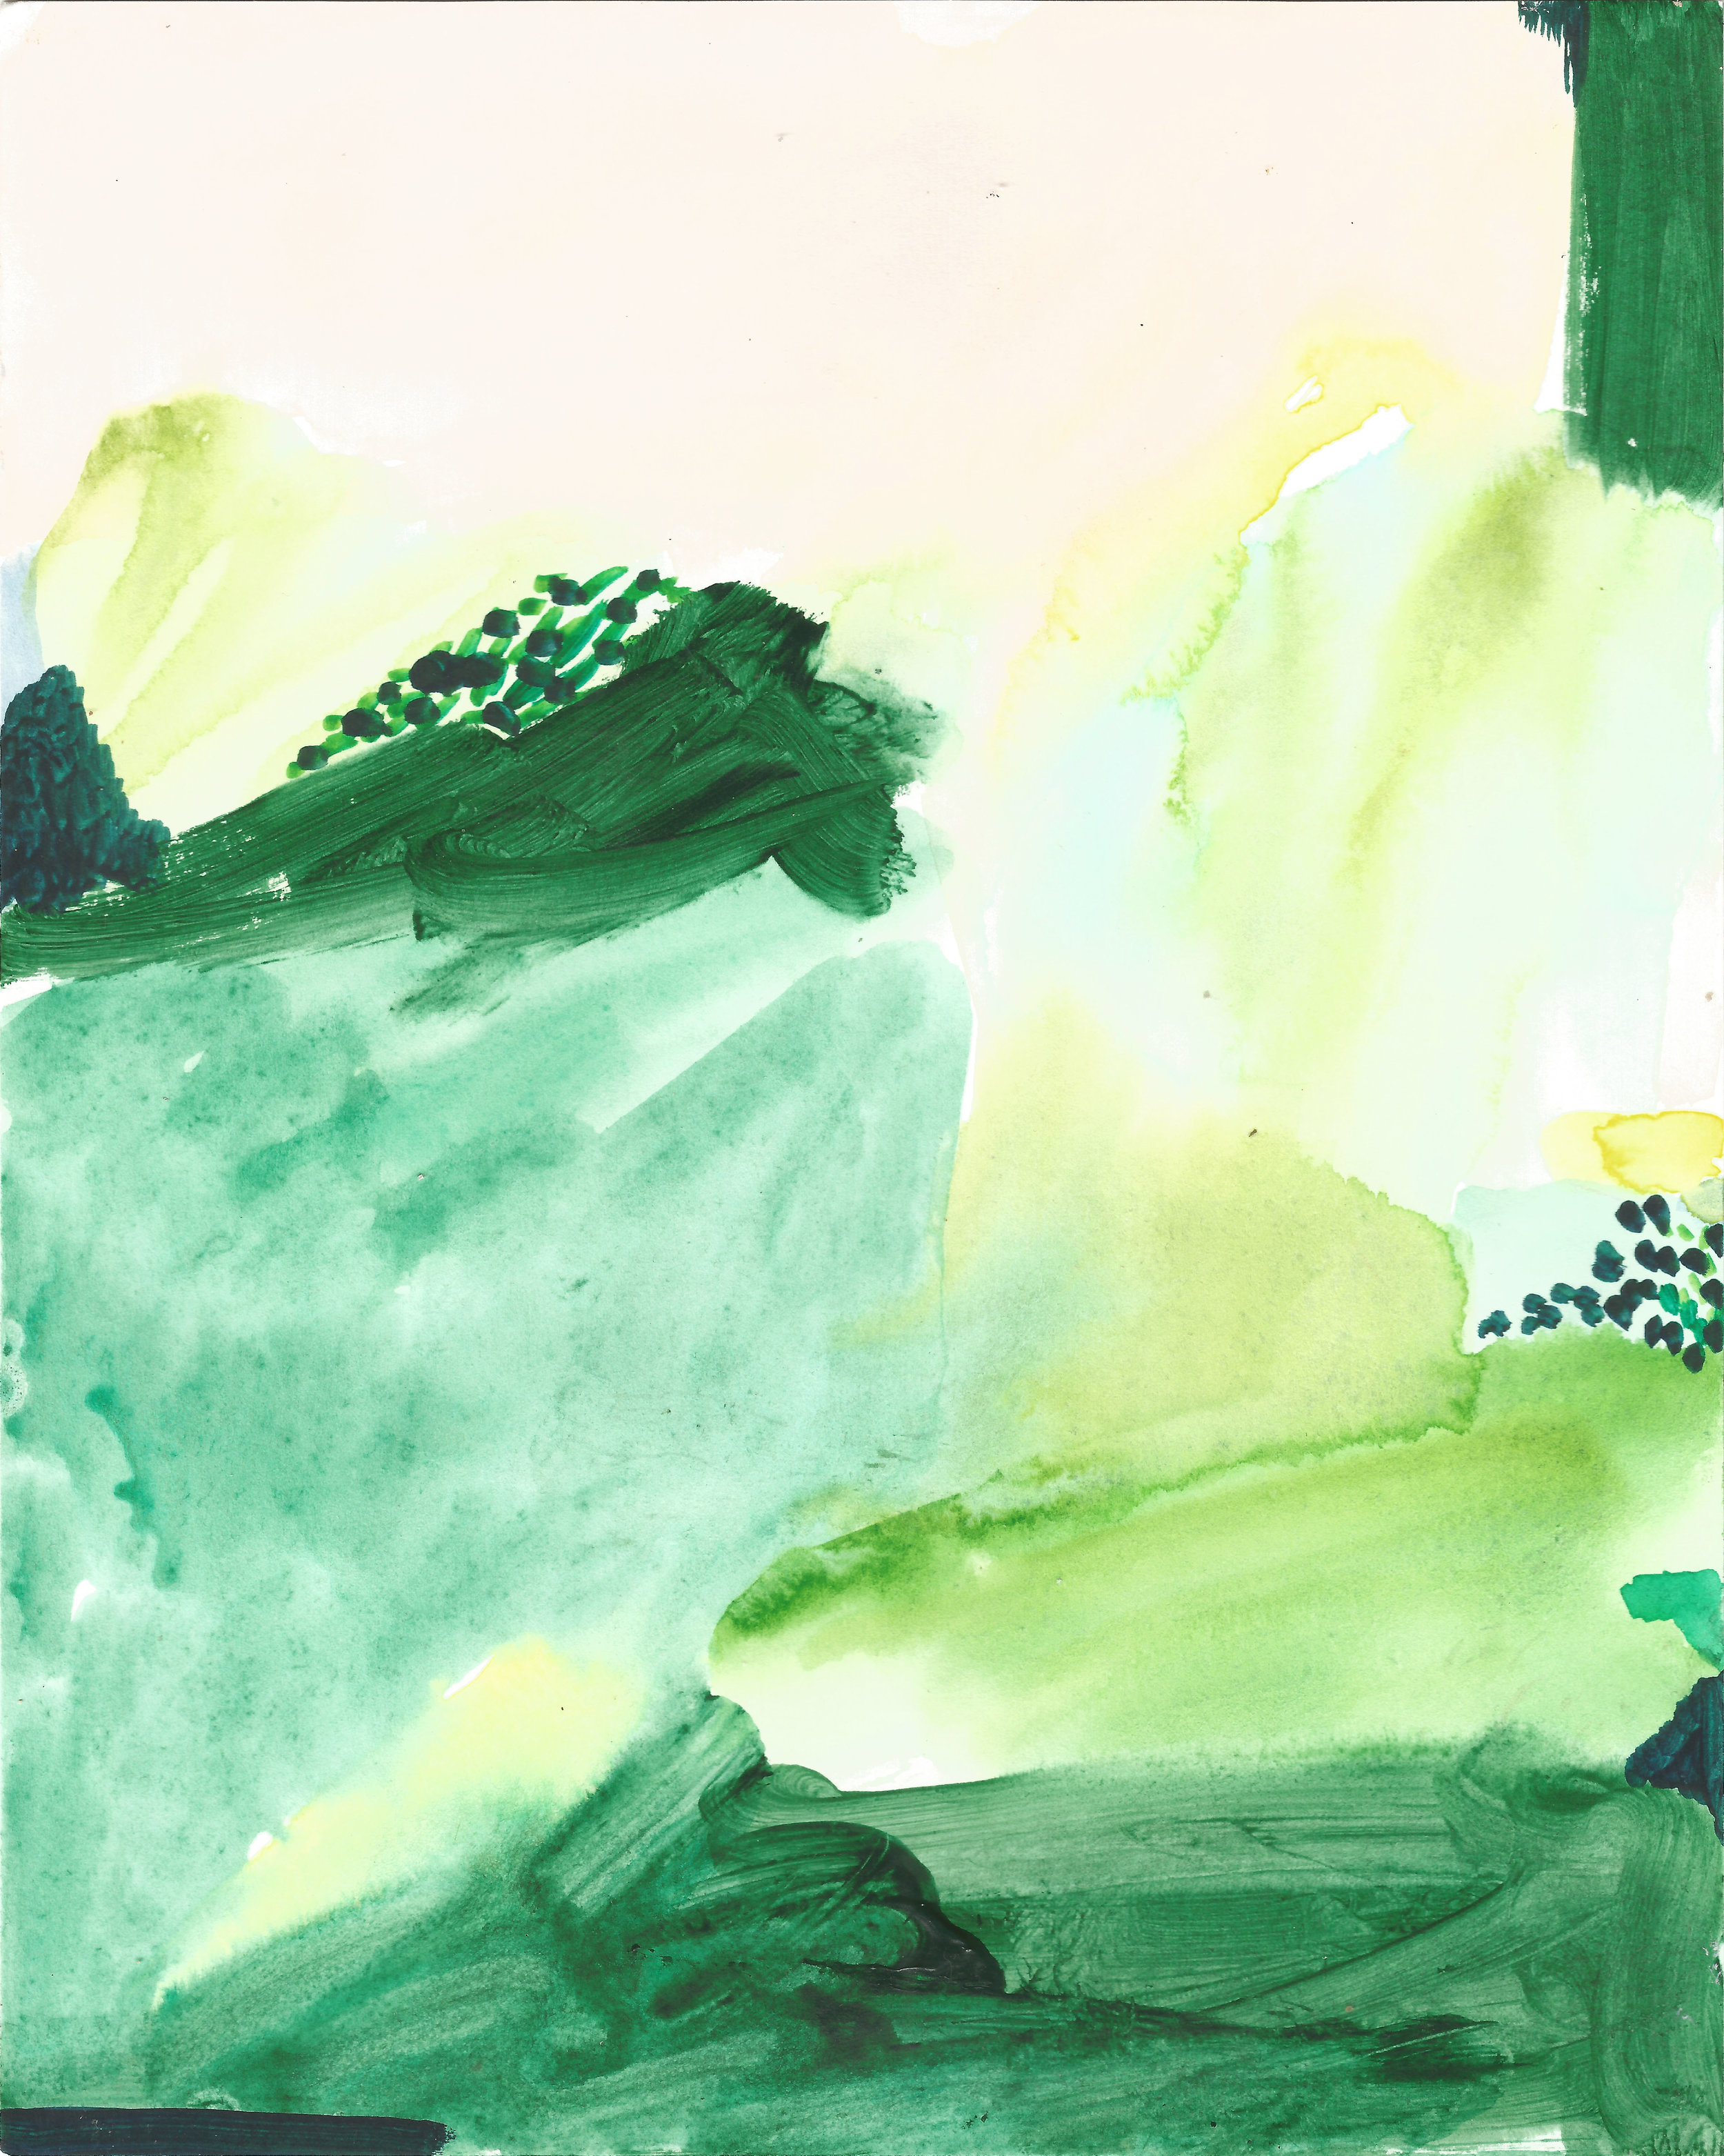 'Summer Walk' 2018 - watercolour & acrylic on paper